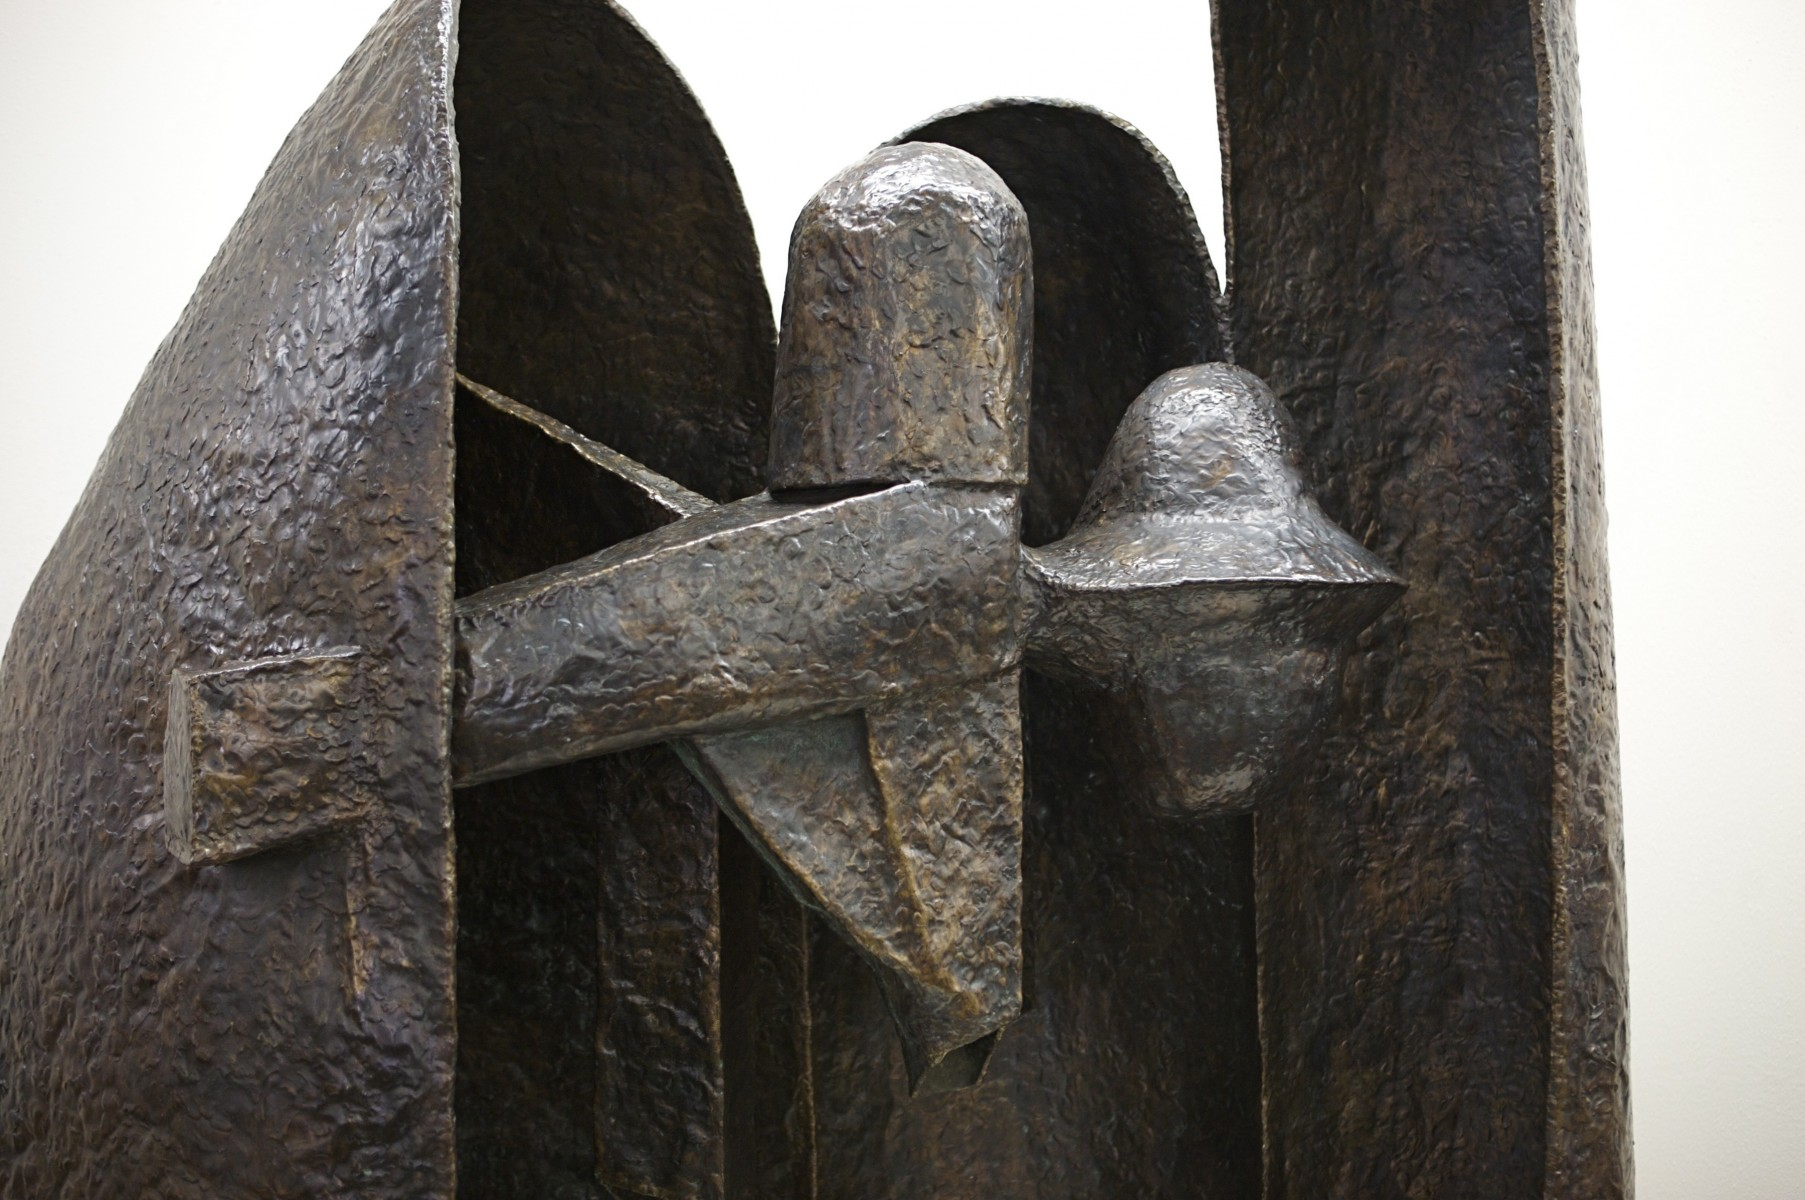 Close up of sculpture